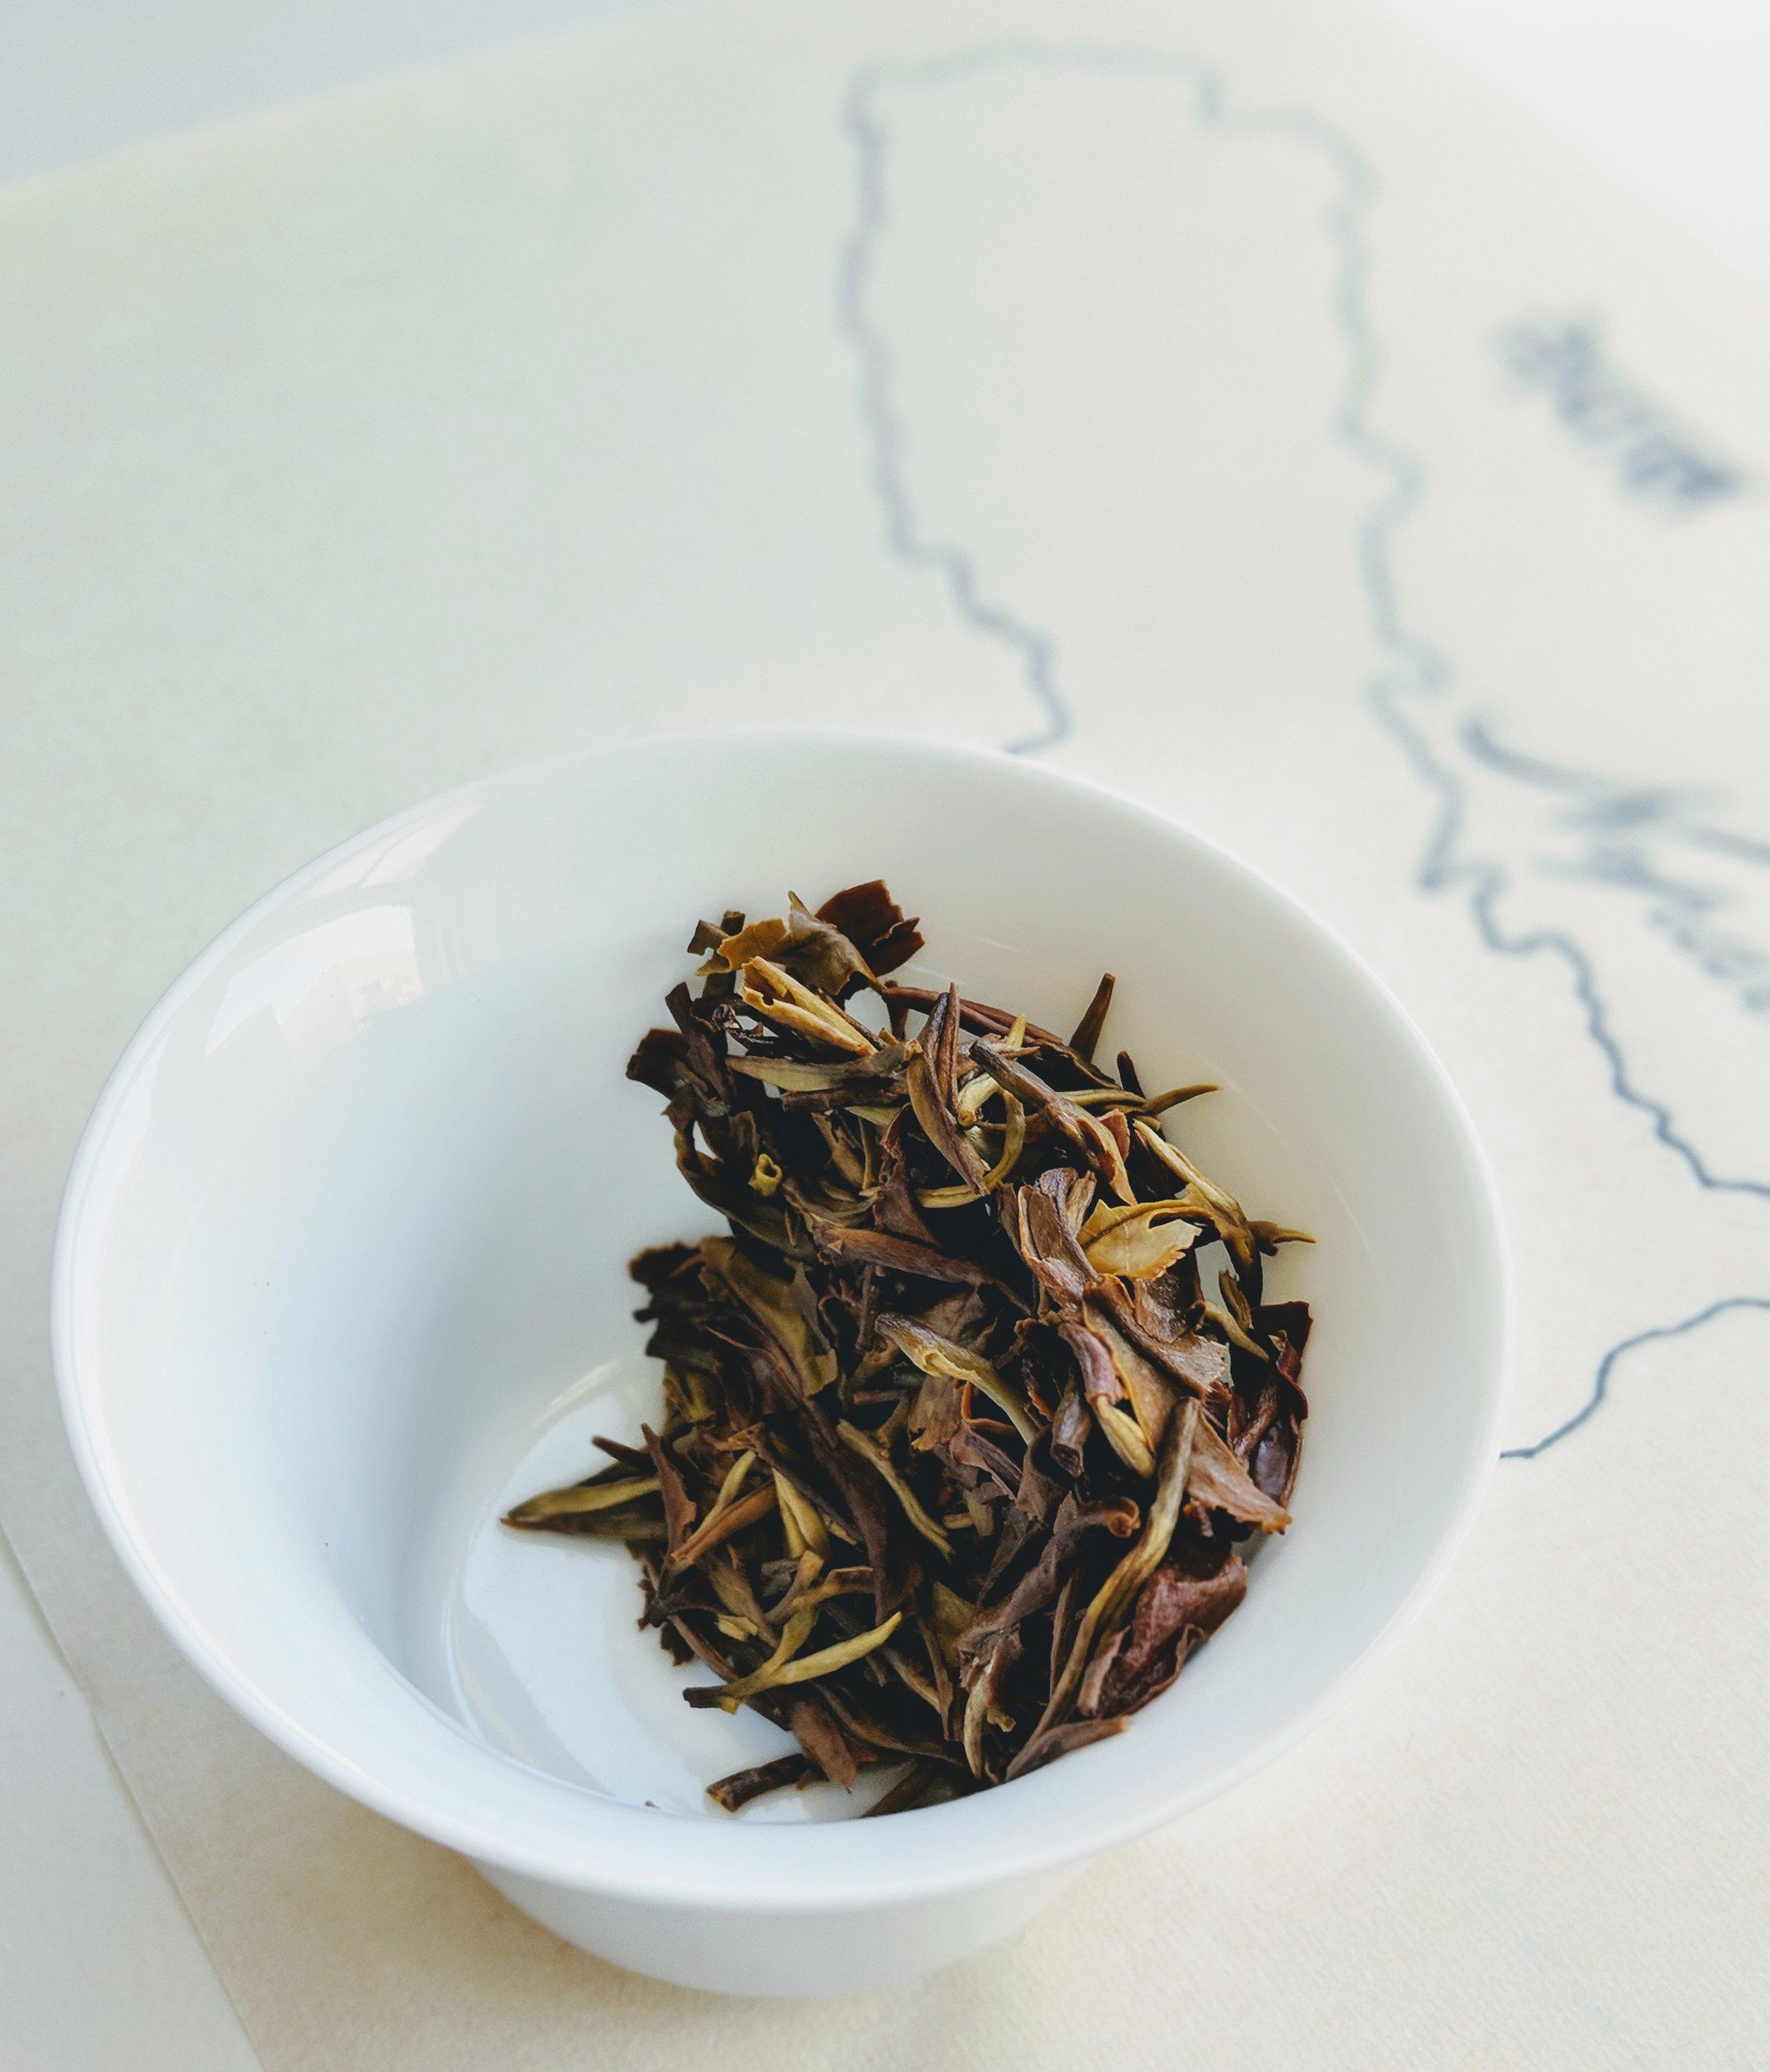 Rara Willow White tea from Nepal